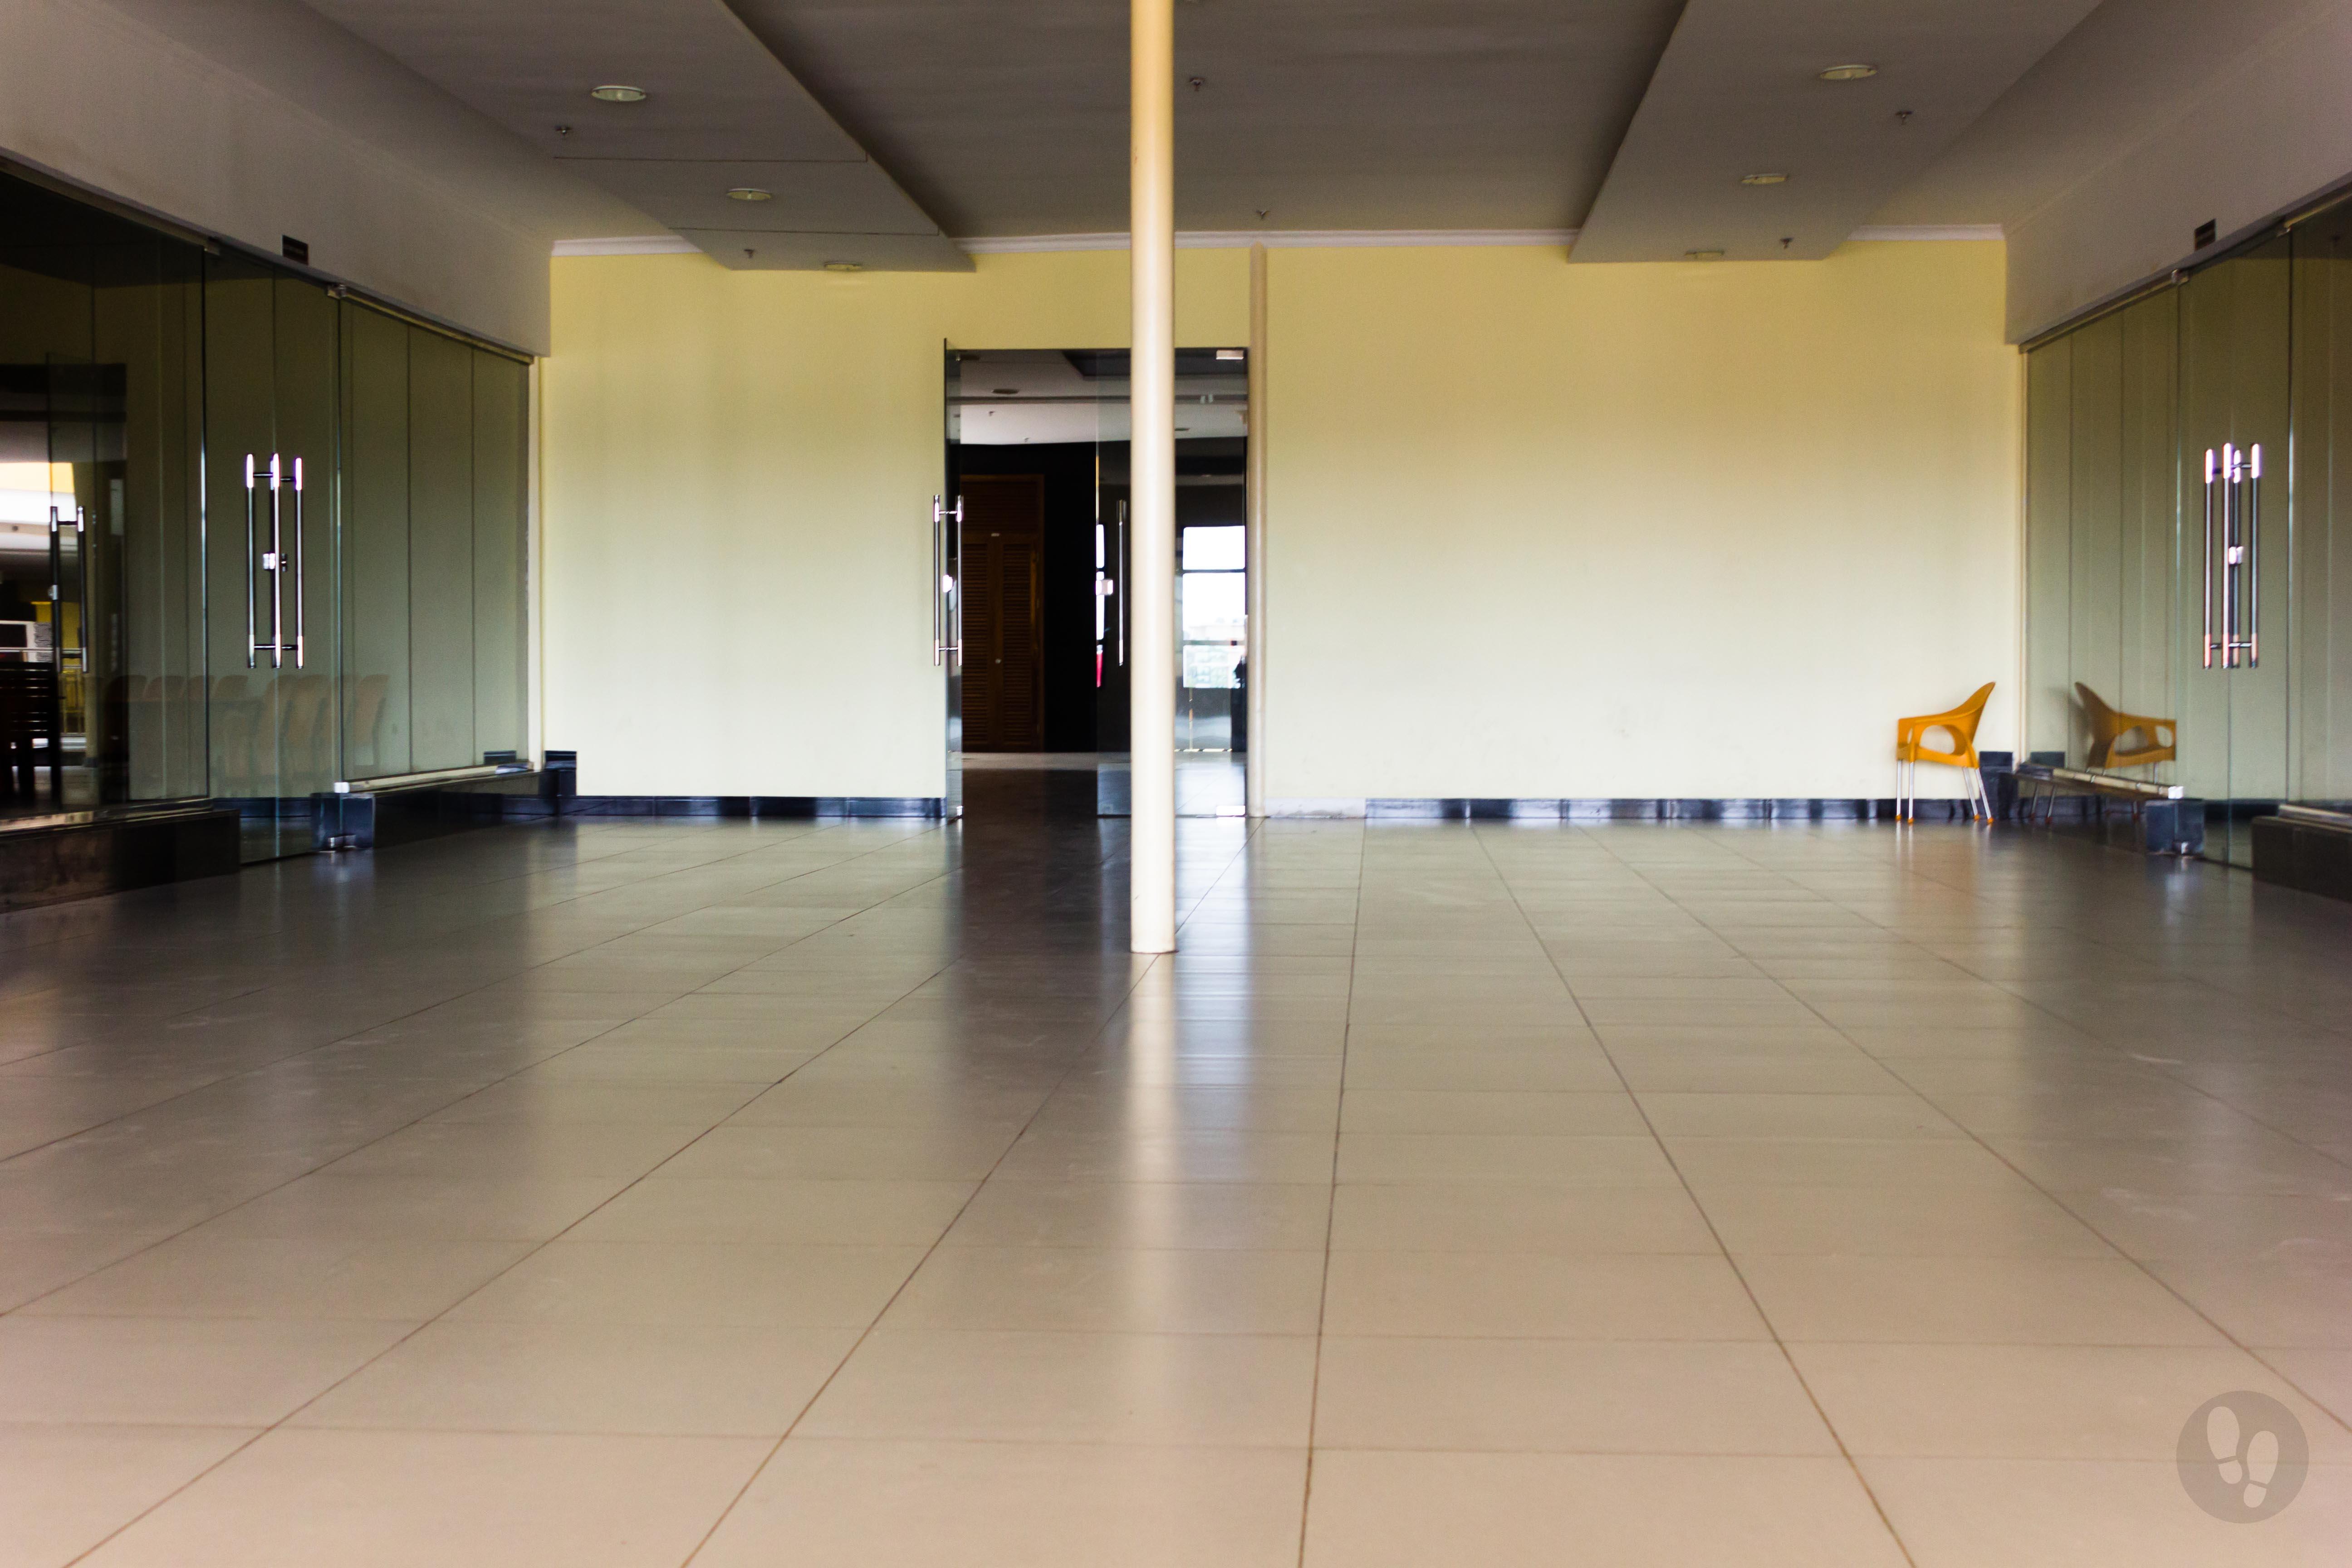 rockcity mall-54.jpg